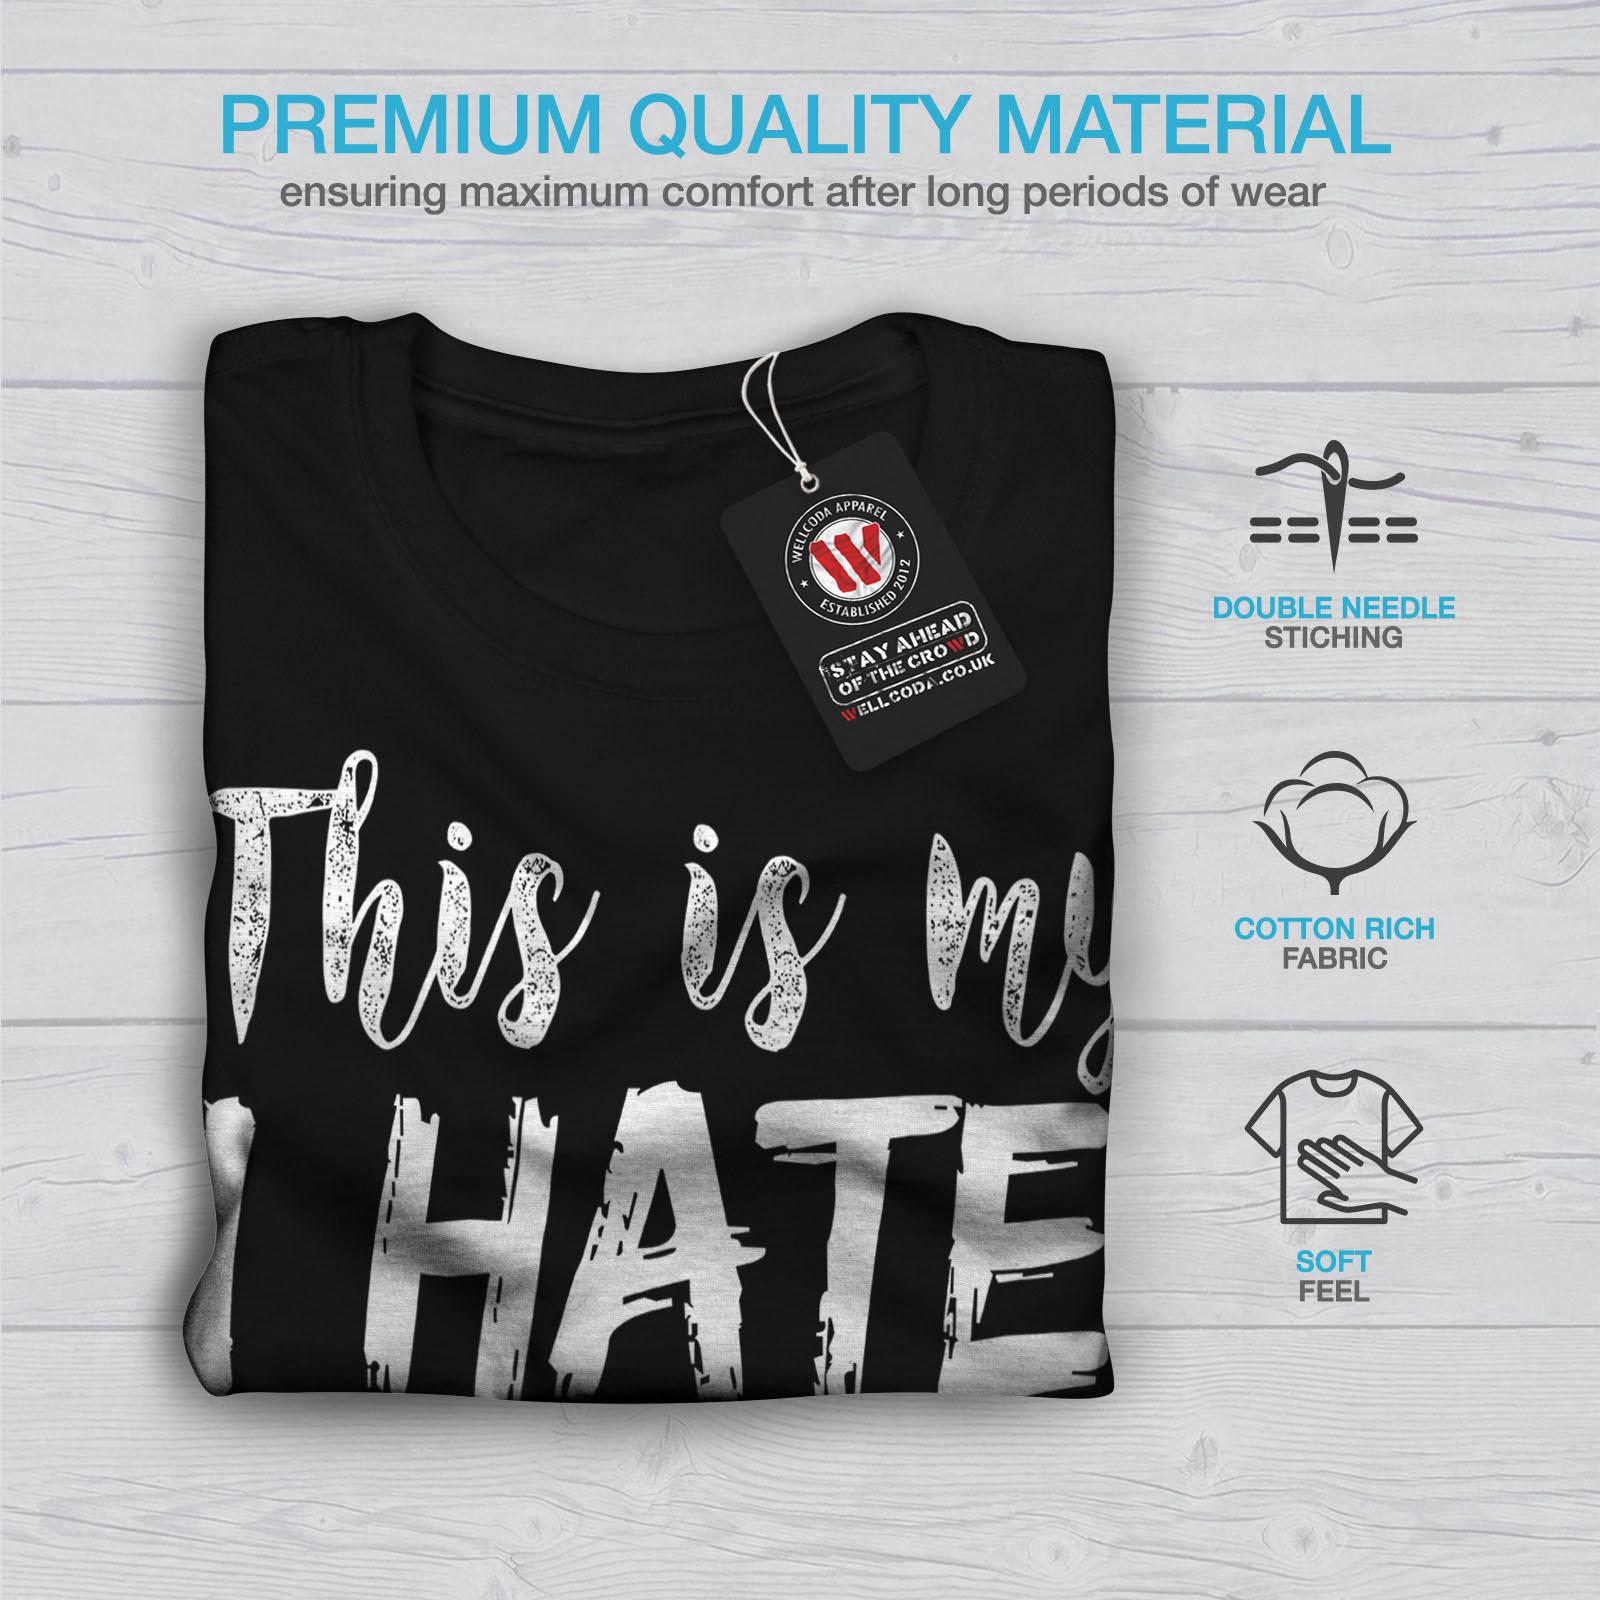 Wellcoda-hasse-alle-heute-Herren-T-Shirt-lustige-Grafikdesign-Printed-Tee Indexbild 7